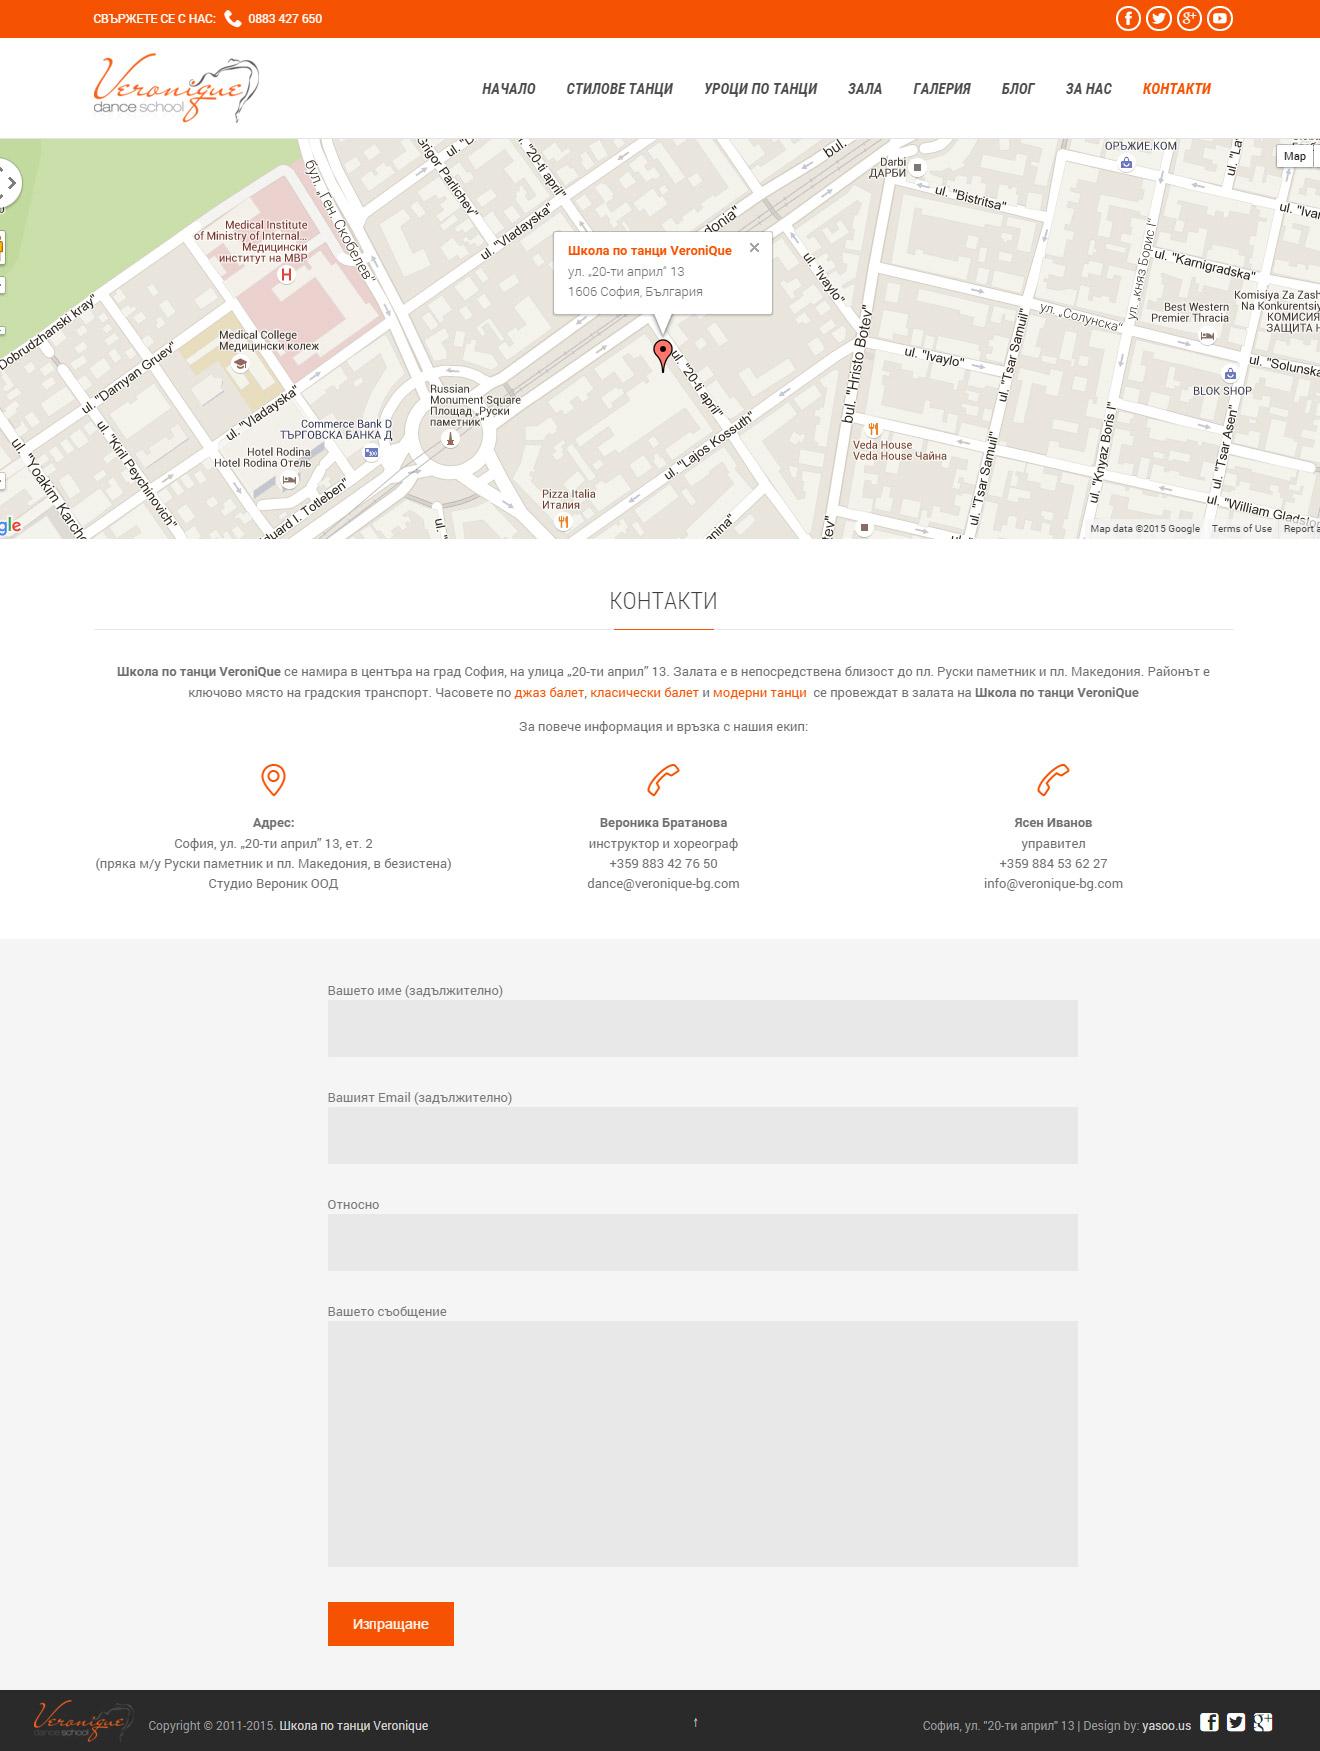 veronique-new-website4